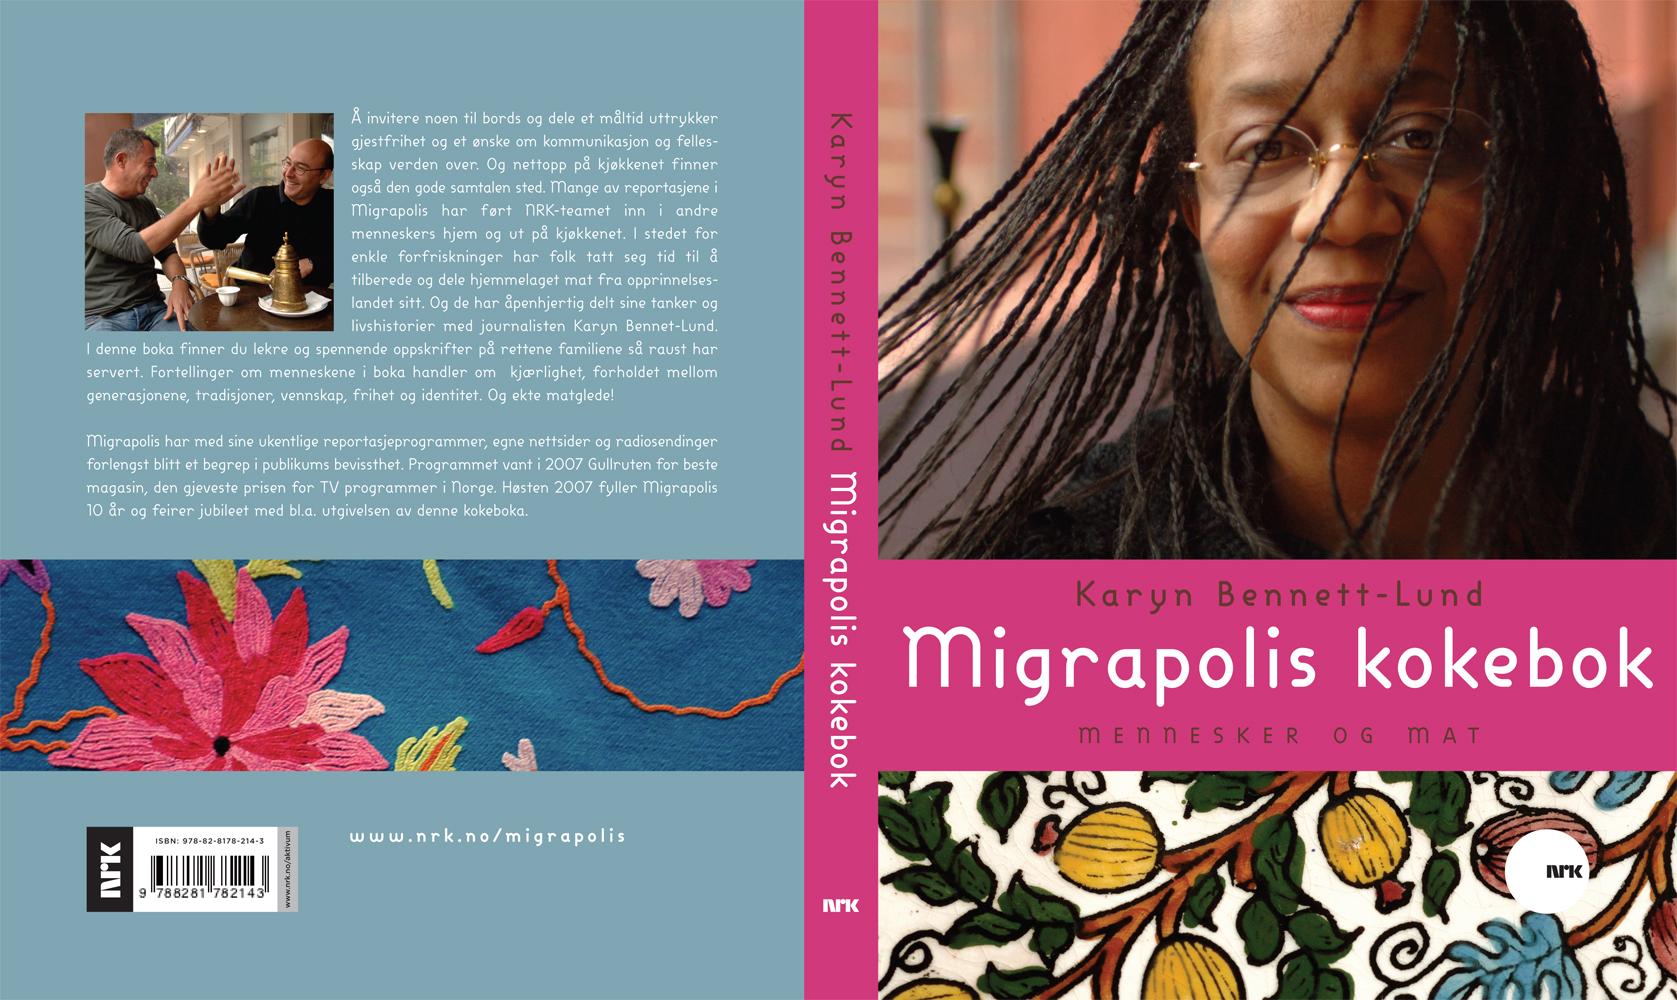 Migrapolis kokebok [ omslag ]